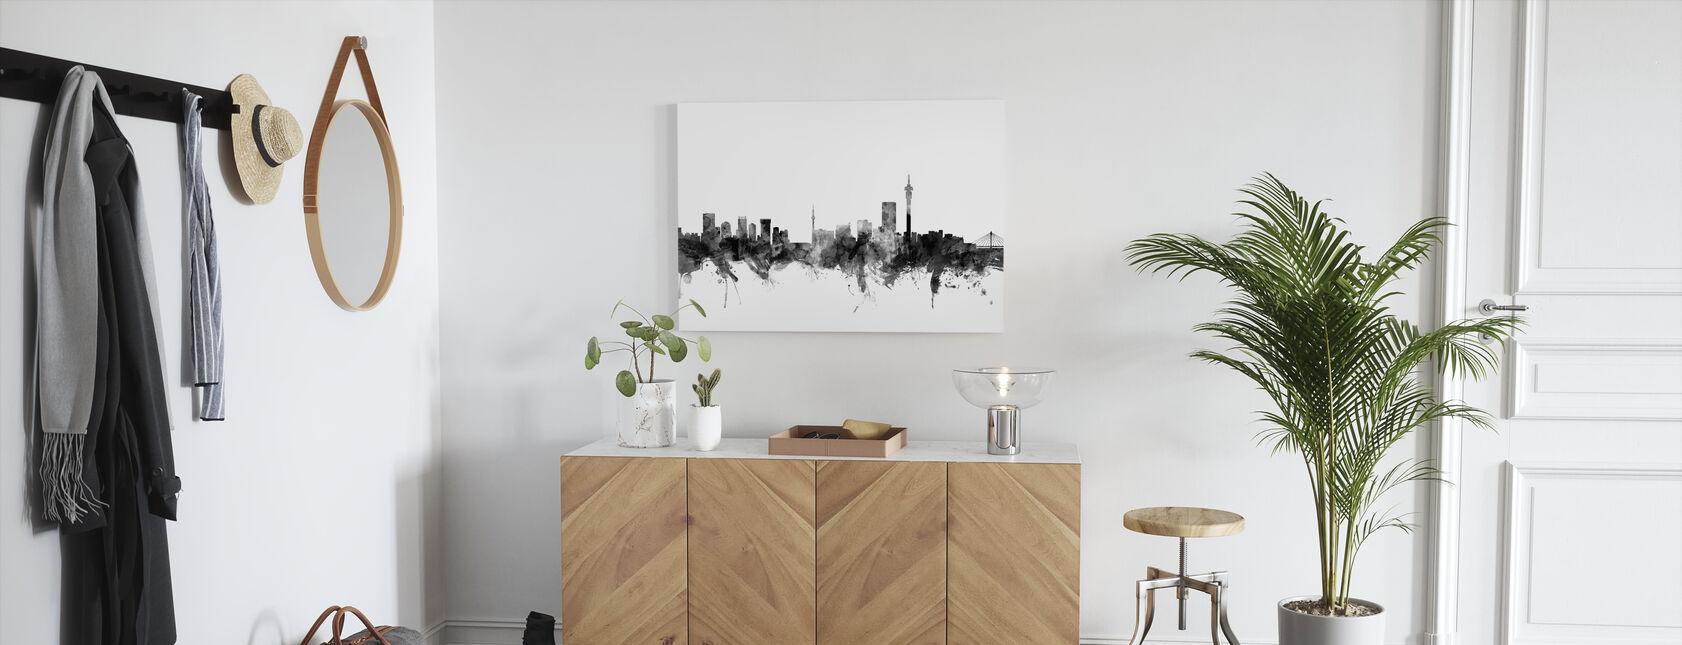 Johannesburg South Africa Skyline Black - Canvas print - Hallway